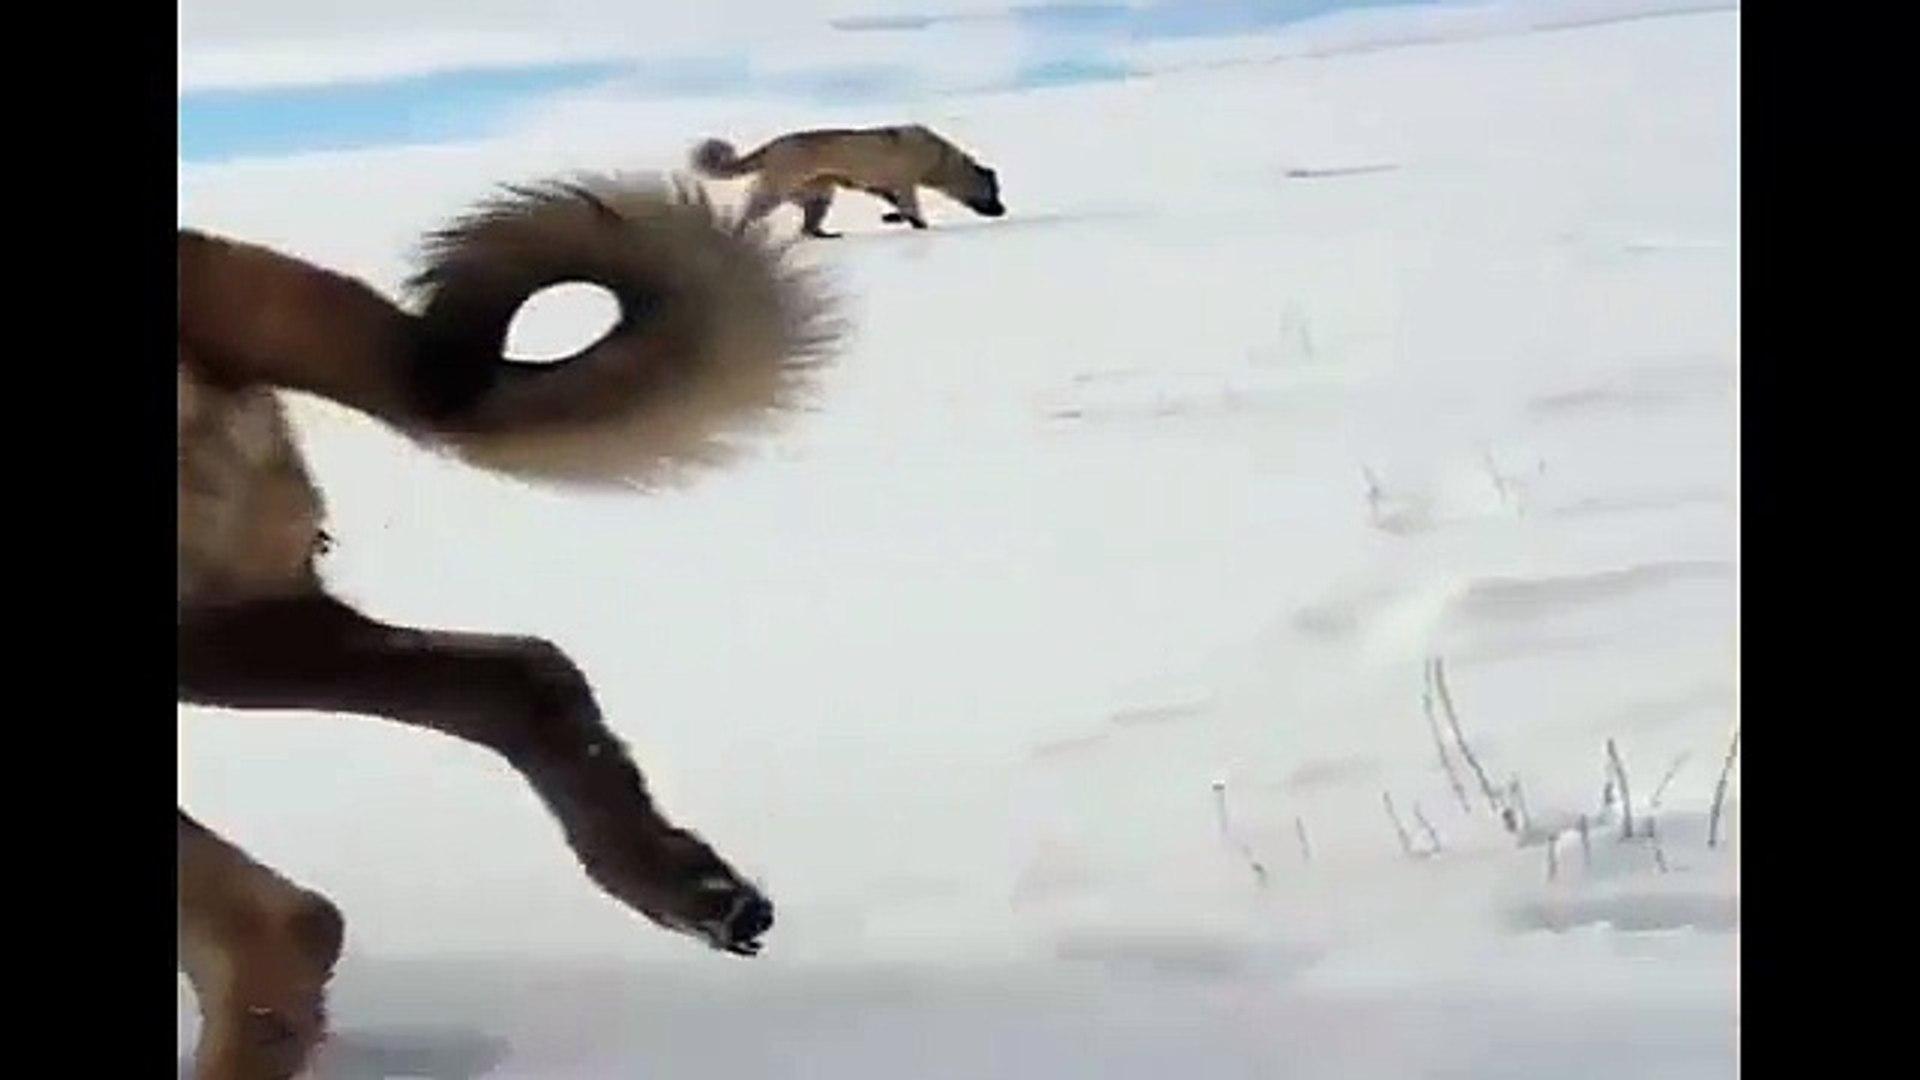 SiVAS KANGAL KOPEKLERiNE KAR TATiLi - ANATOLiAN KANGAL DOGS and SNOW PLAY